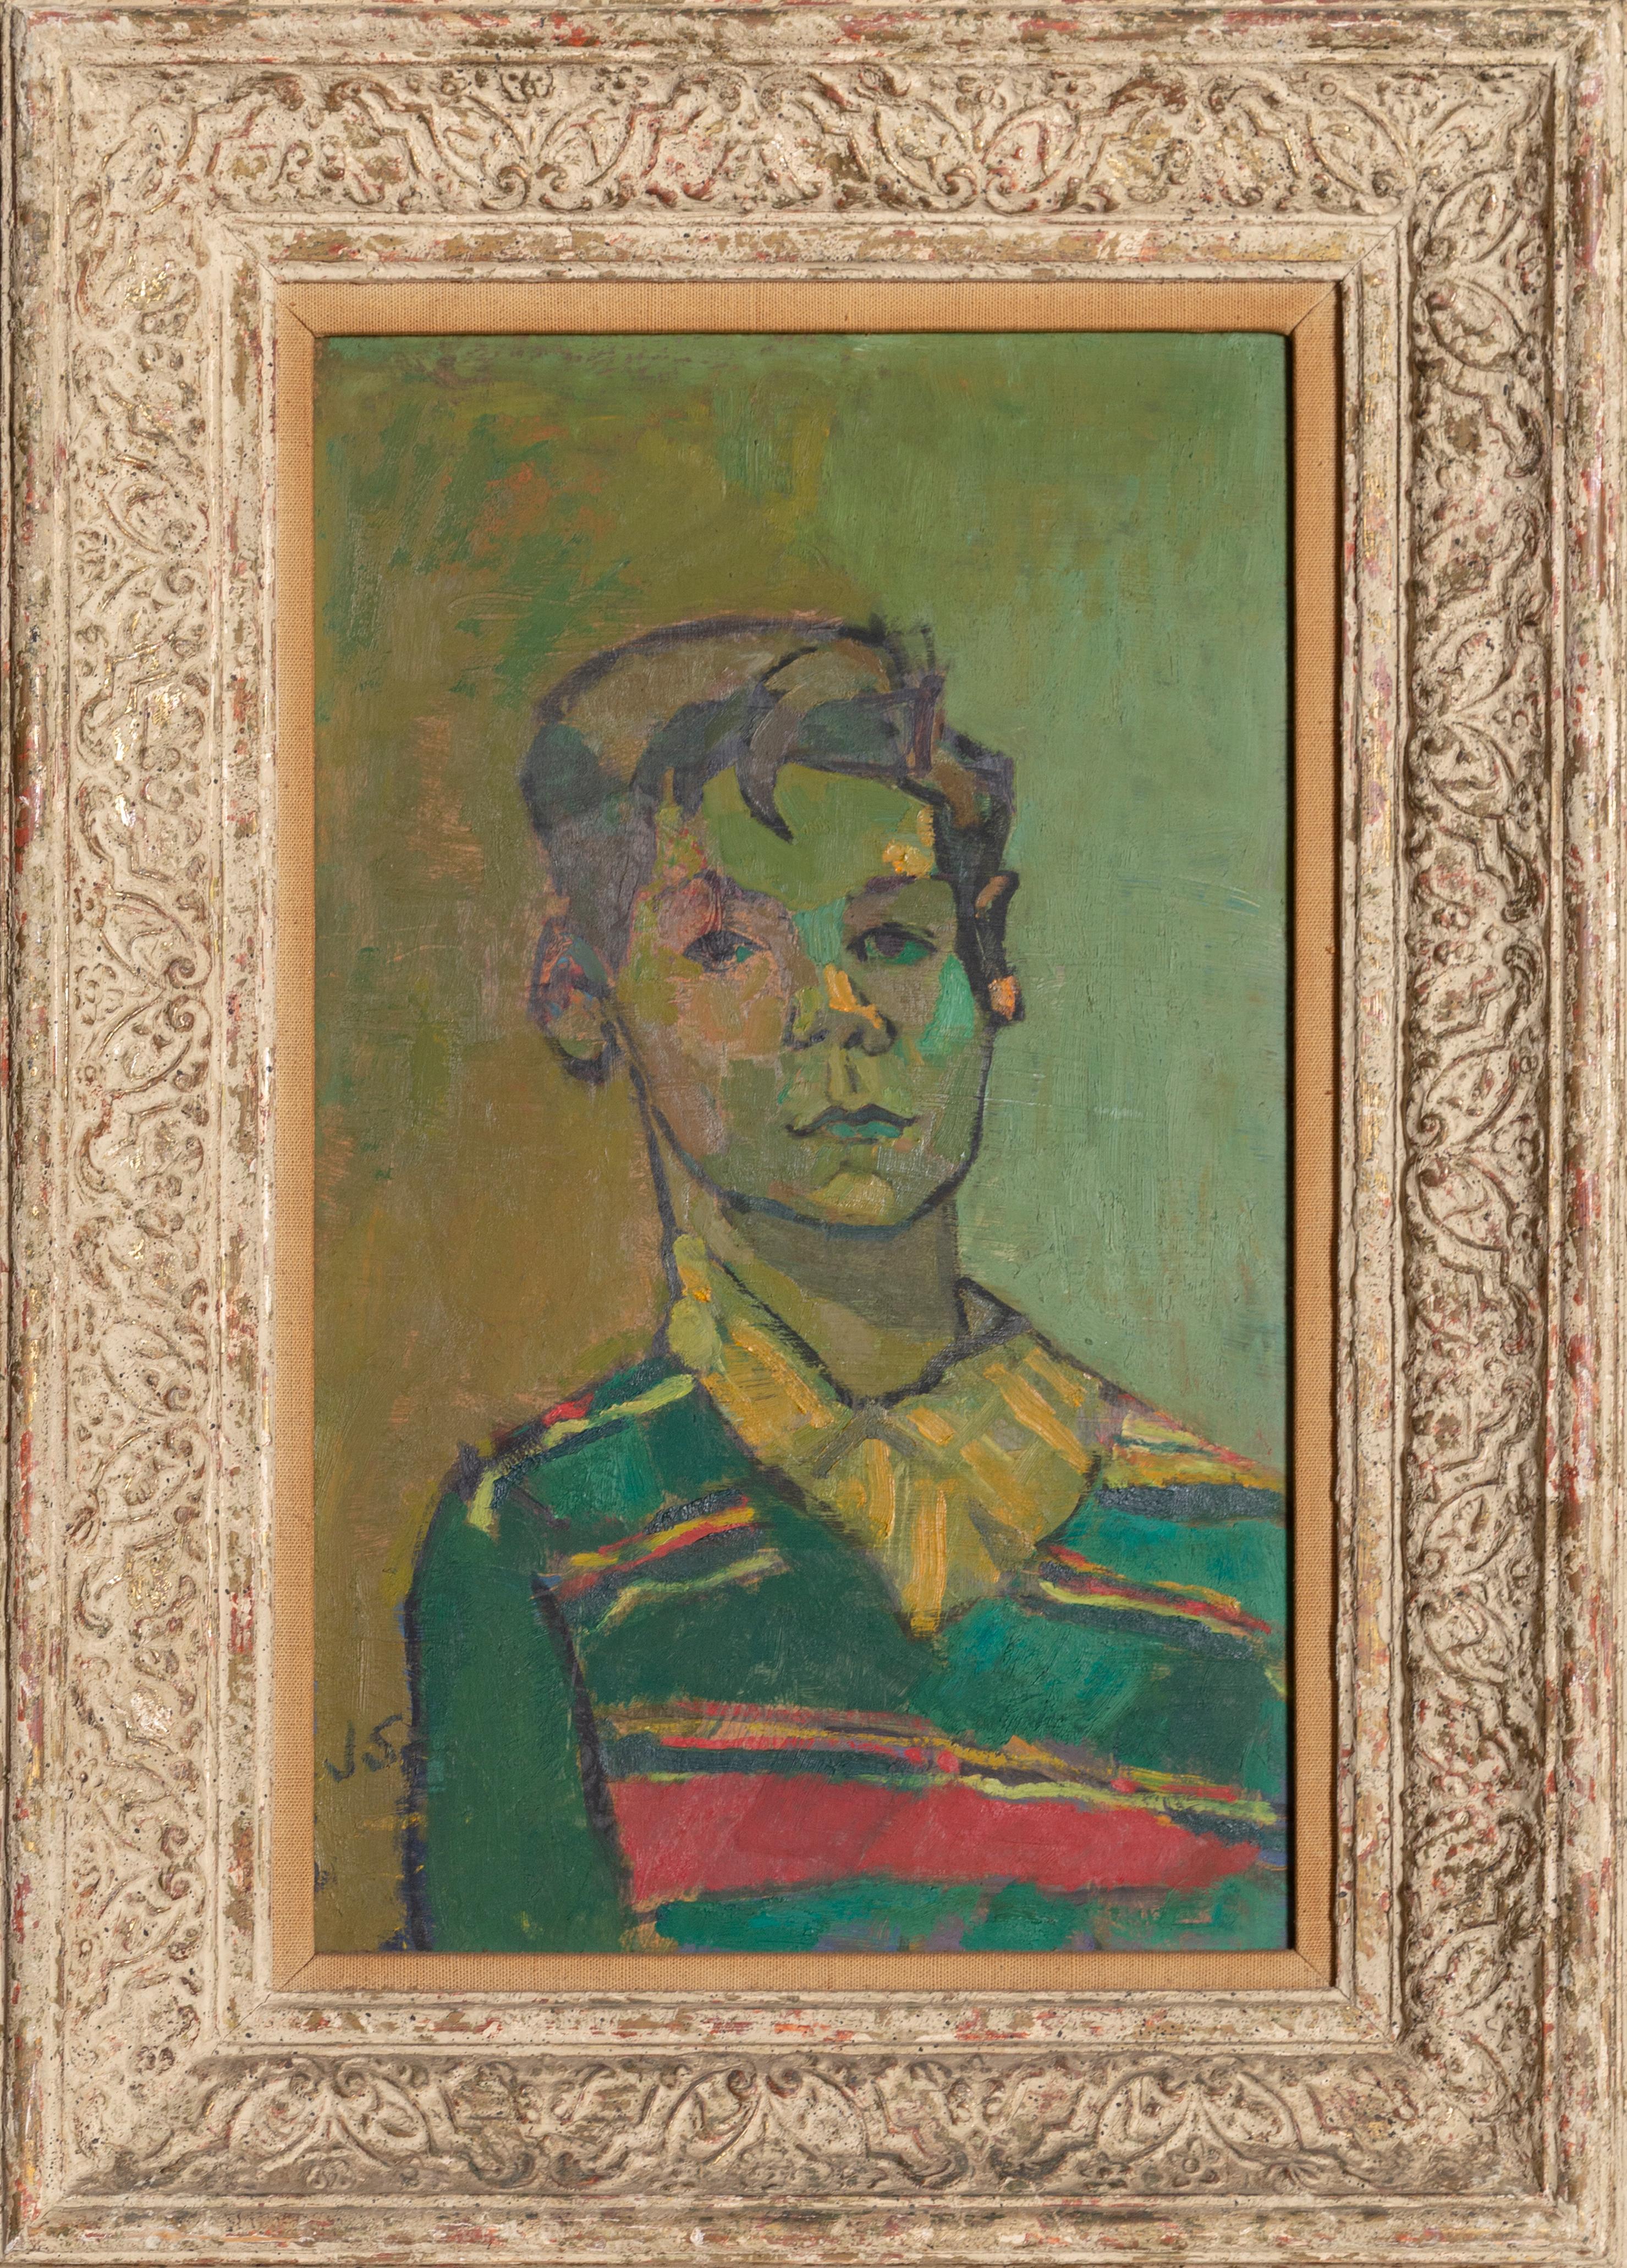 John Begg Jr., Expressionist Portrait by Joseph Solman